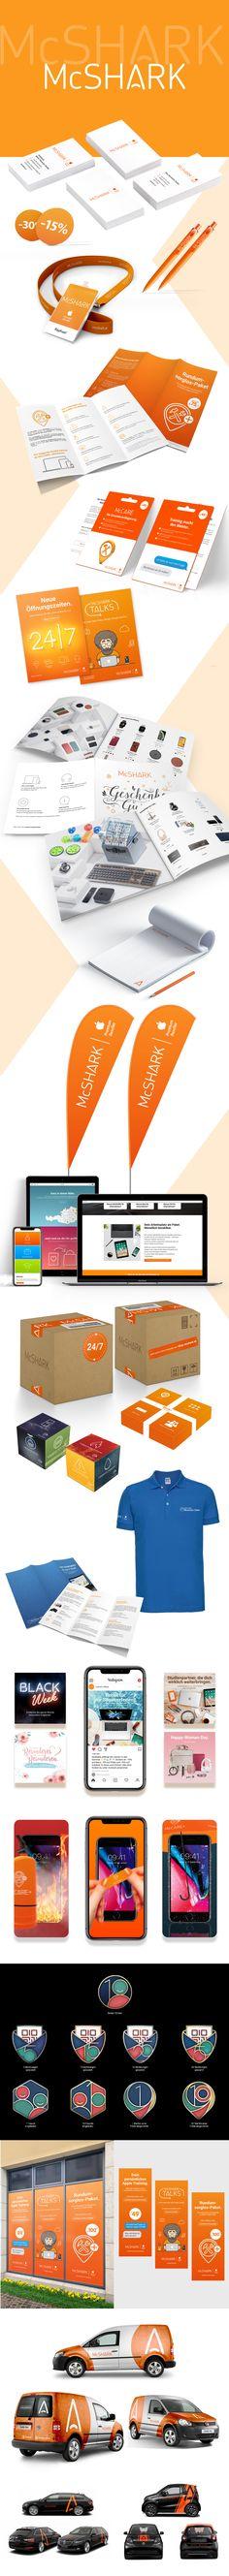 McShark - Corporate Design - designed by Designerpart - www.designerpart.com